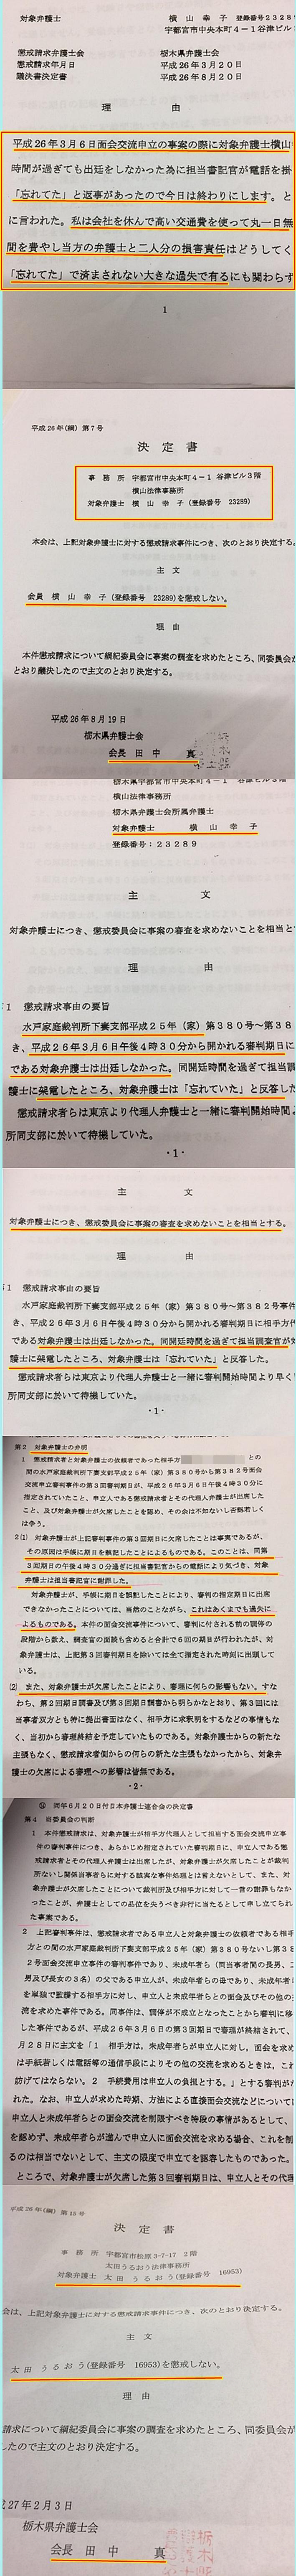 横山幸子弁護士 横山法律事務所 栃木県弁護士会 太田うるおう綱紀委員会